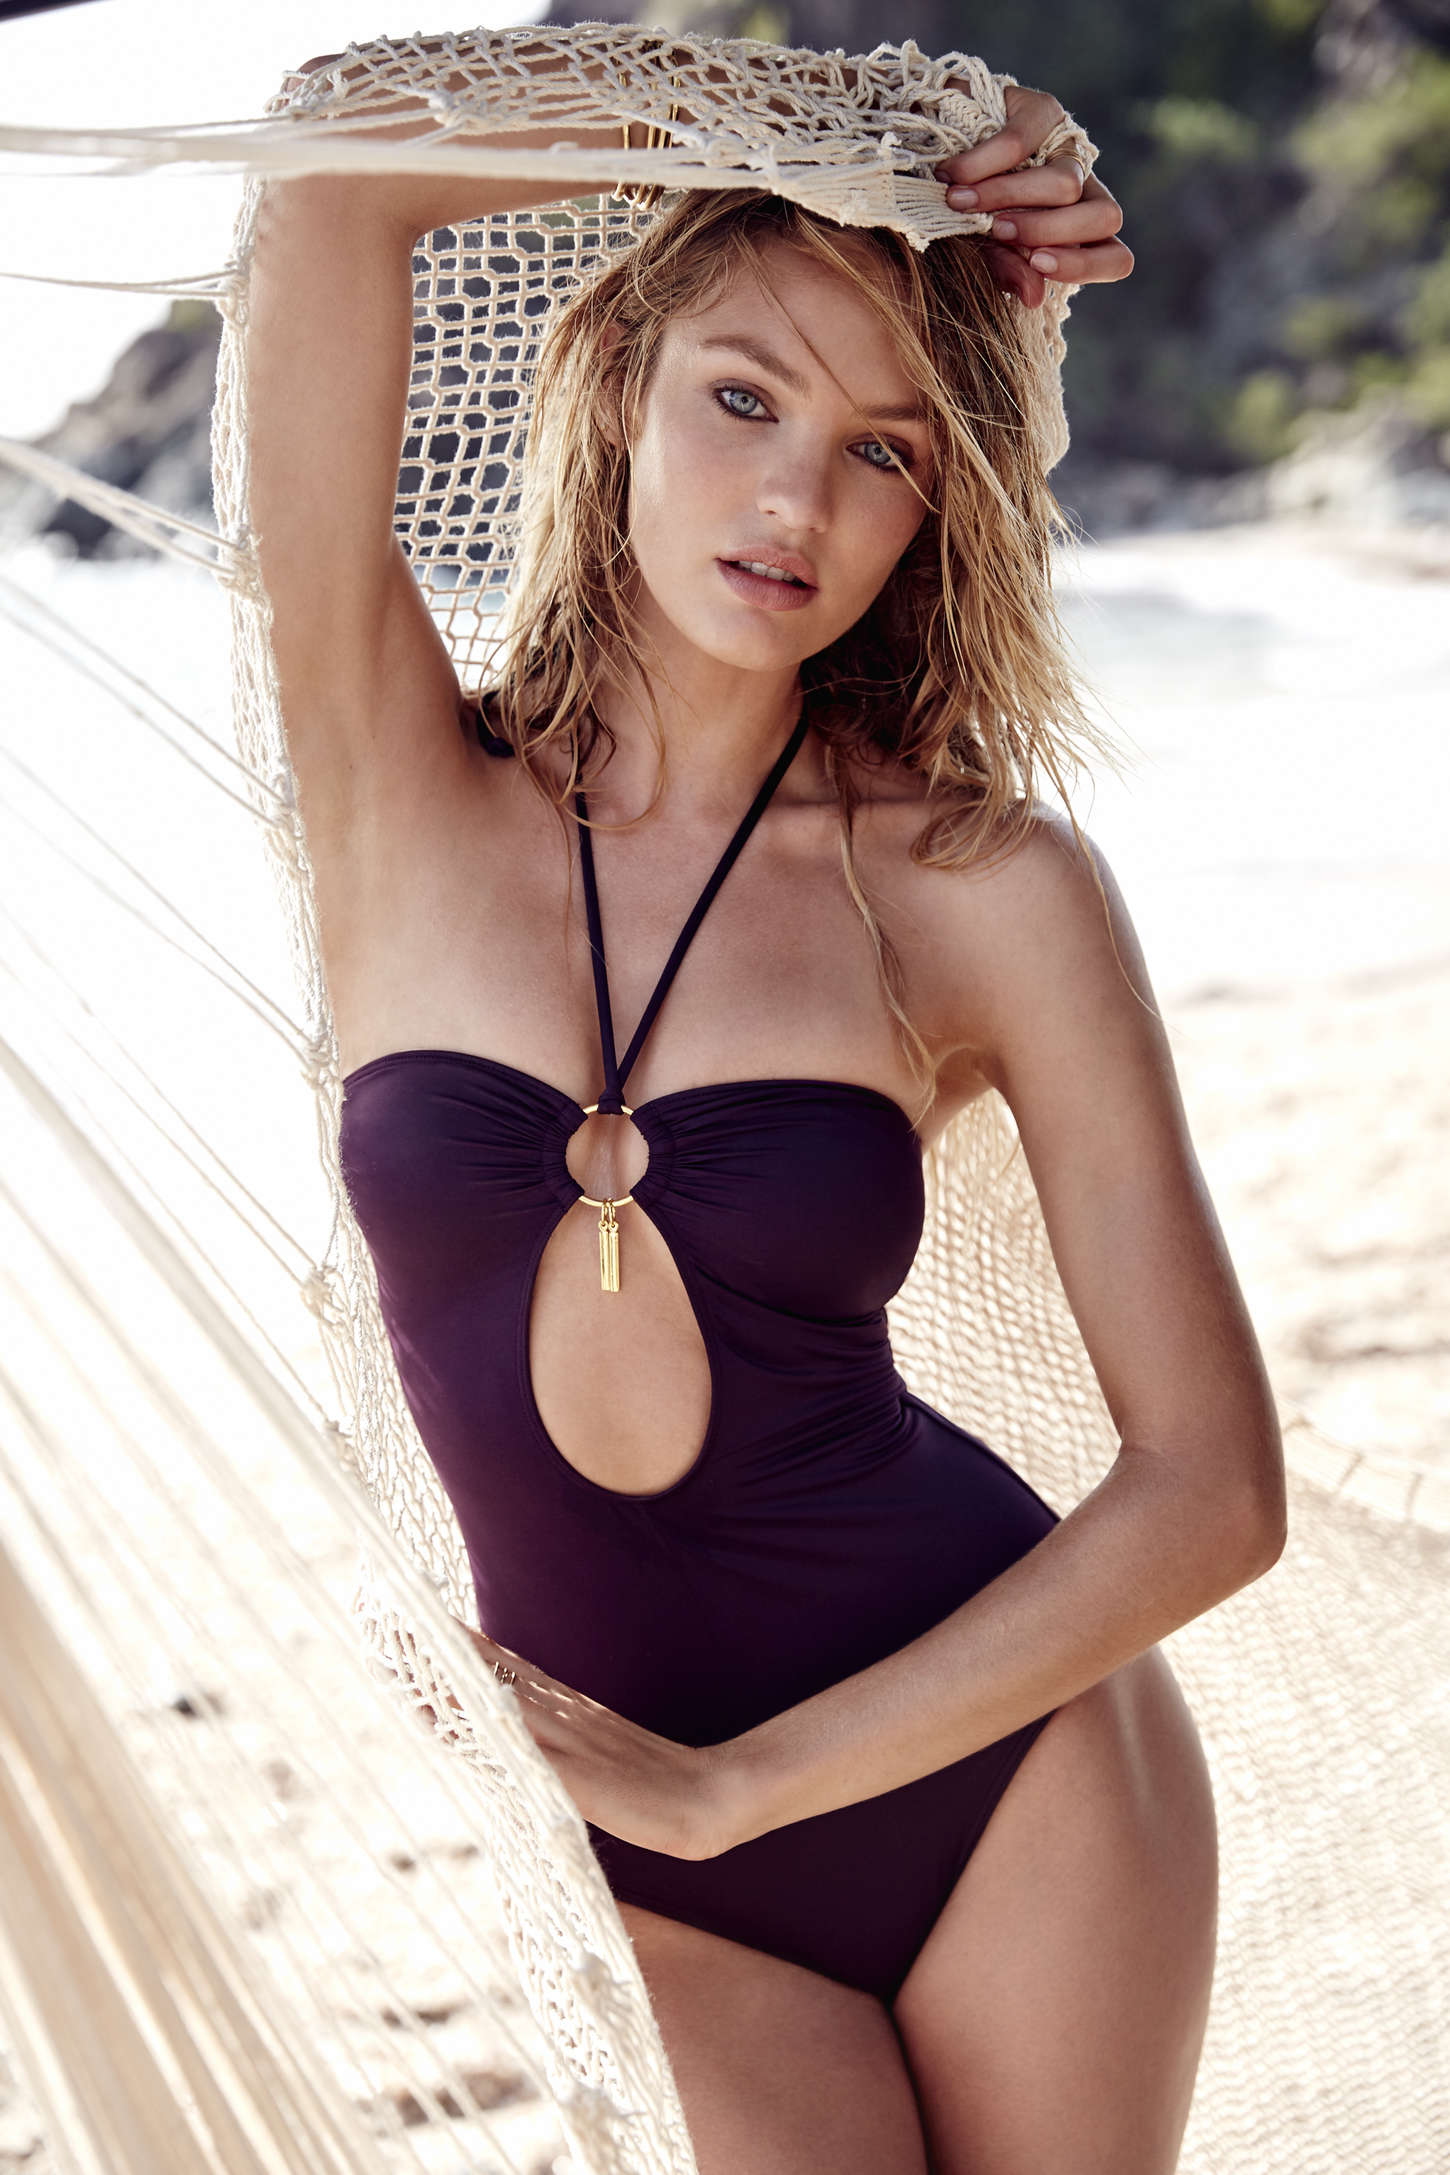 Candice Swanepoel 2015 : Candice Swanepoel: VS Swim Catalog 2015 -04